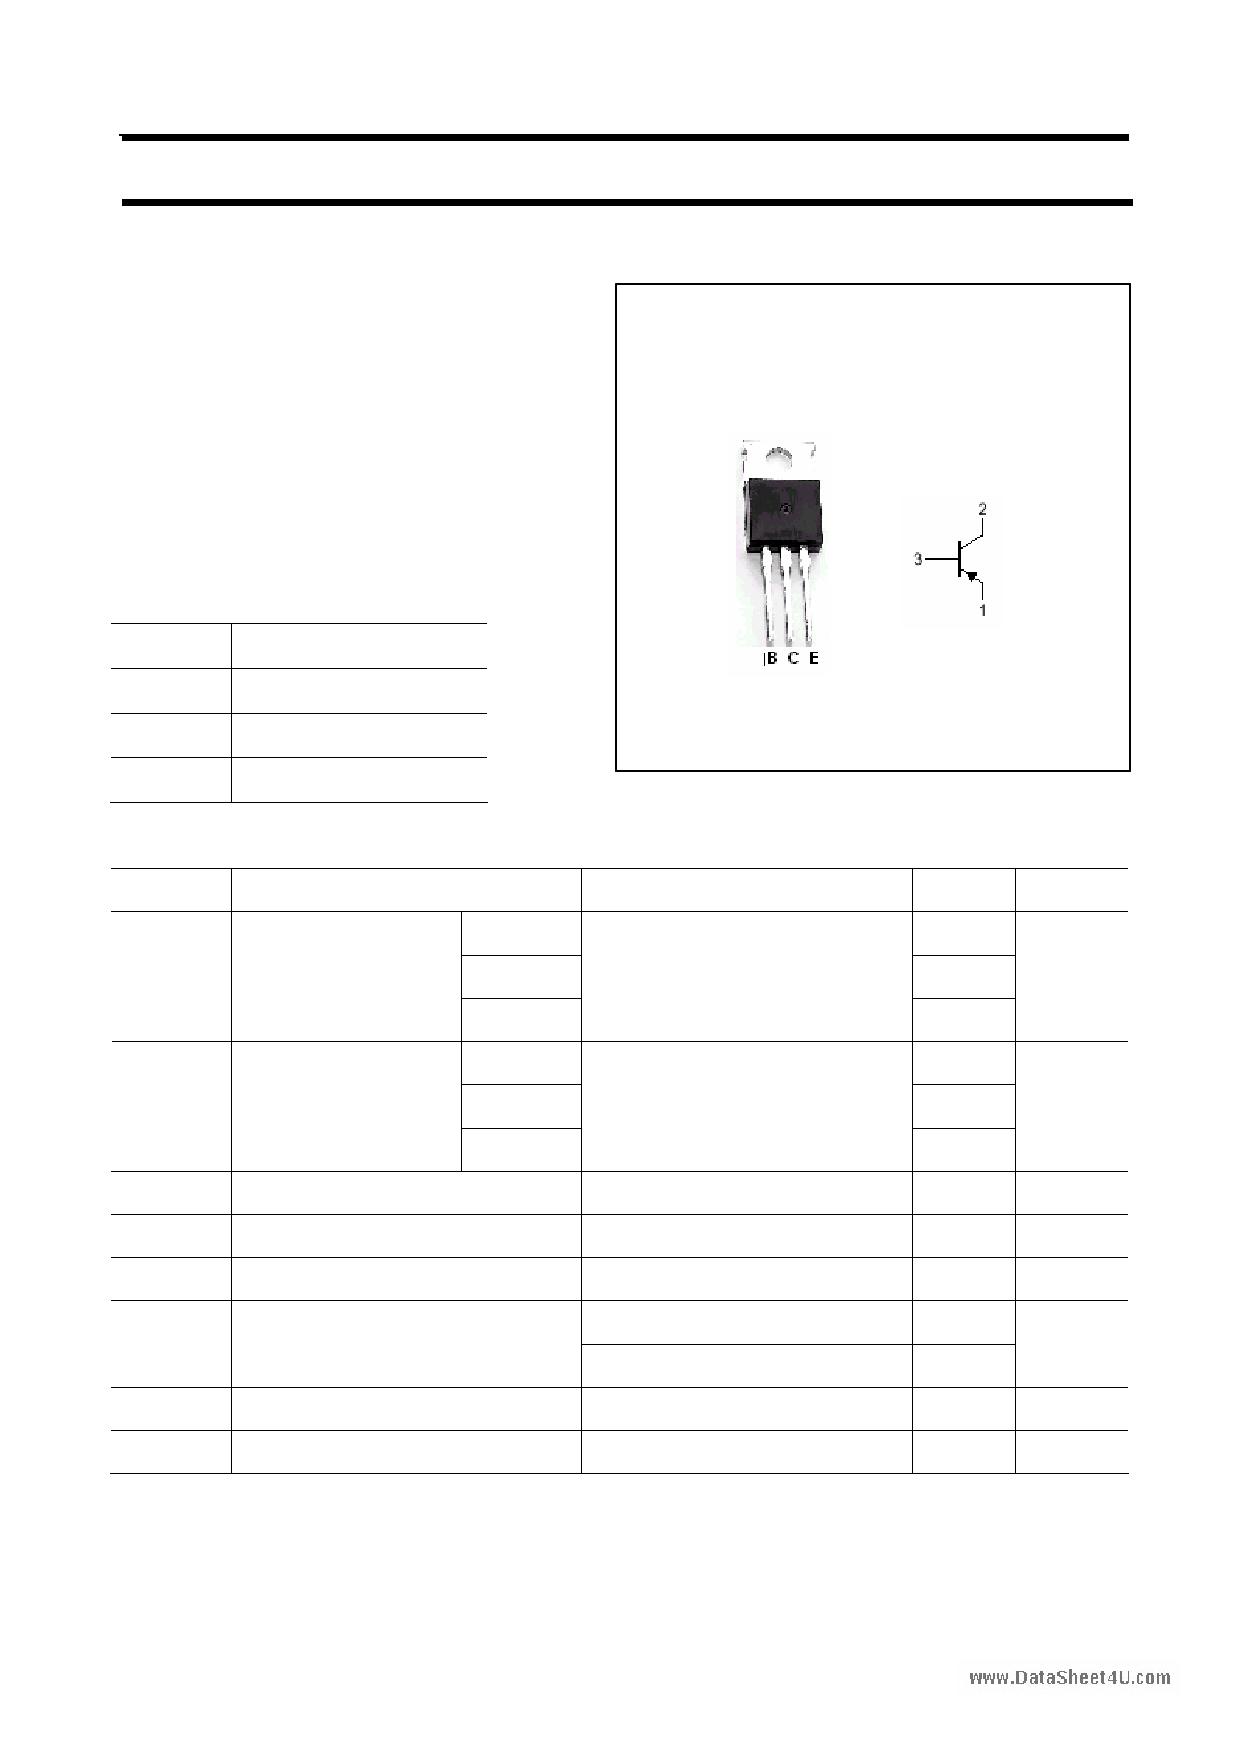 A1006 datasheet, circuit